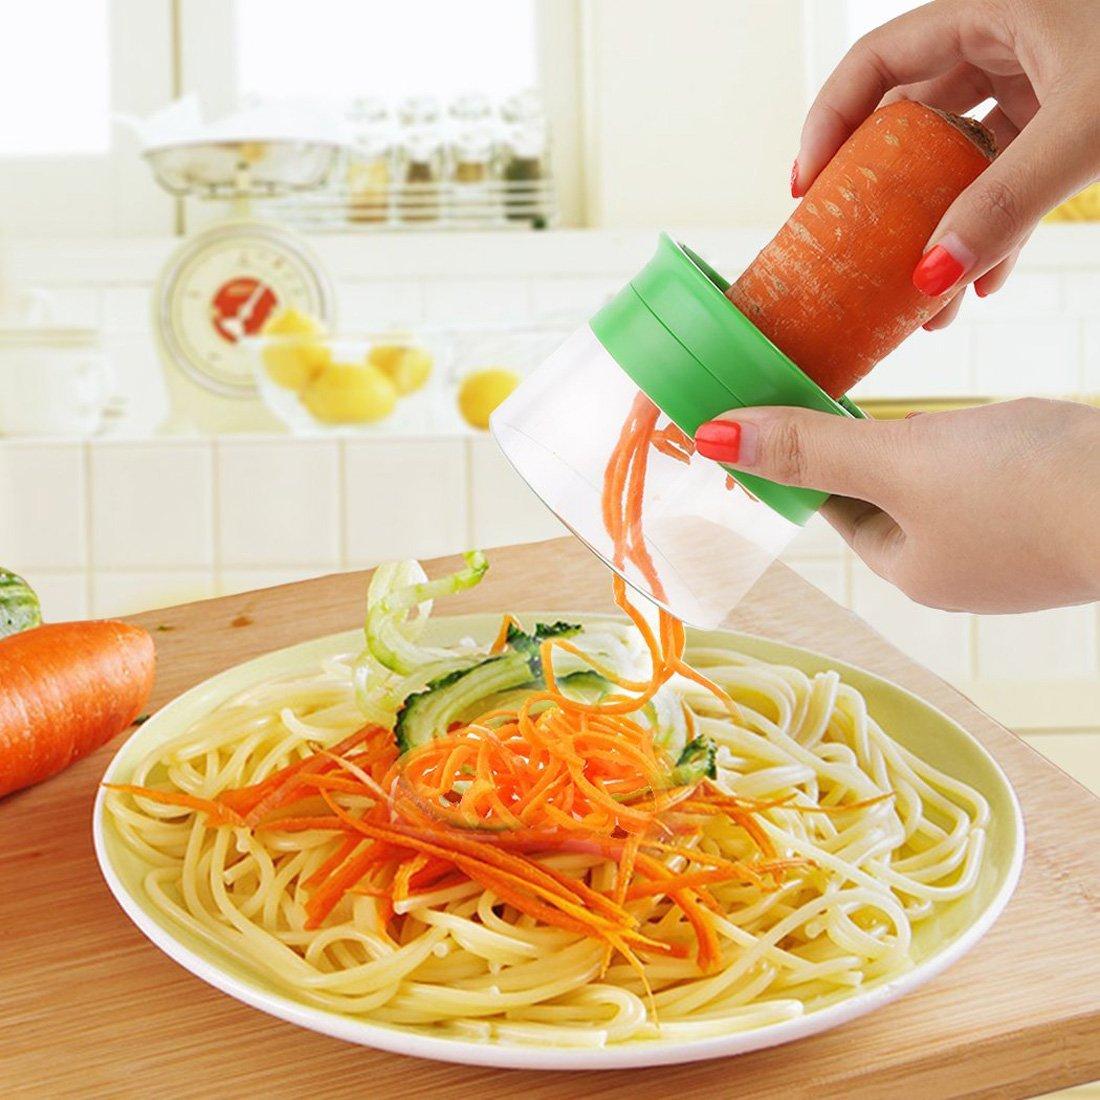 M/öhrenreibe M/öhrensch/äler Zucchini Spargelsch/äler 1-Klingen Gem/üsehobel Gurkensch/äler Gurkenschneider Spiralschneider Set f/ür Gem/üsespaghetti Kartoffel Famstore Spargelsch/äler